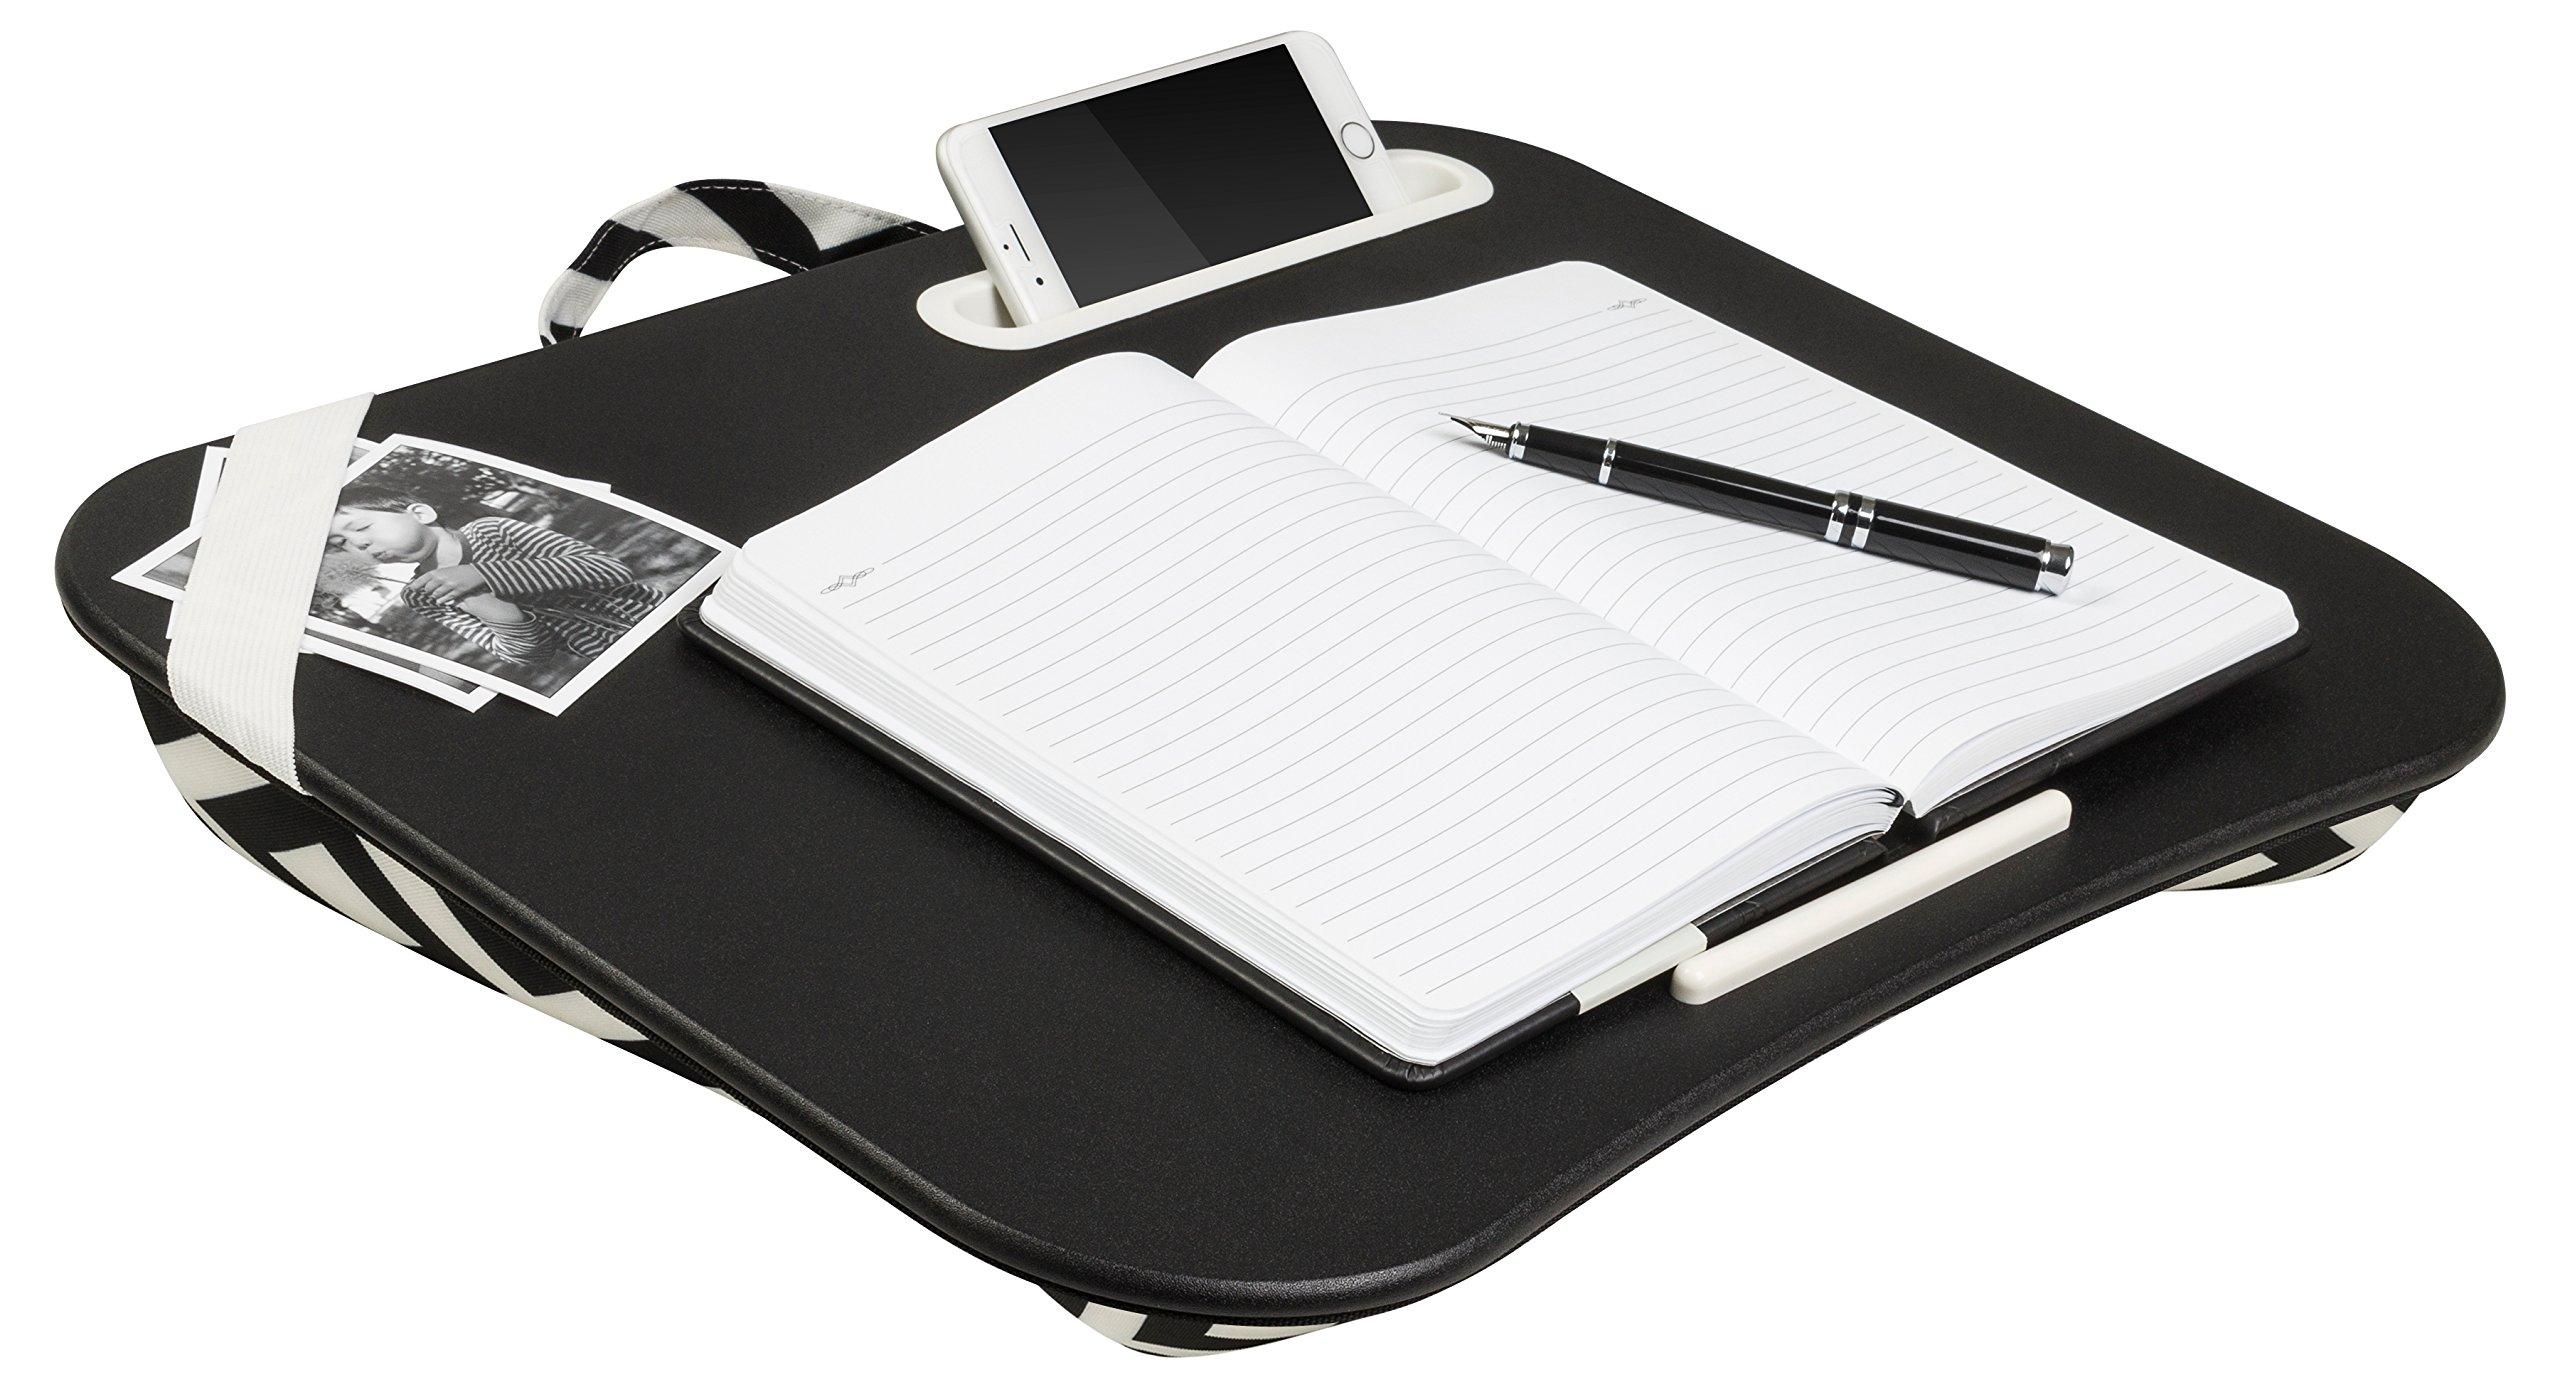 LapGear XL Designer Lap Desk, Black & White Geo (Fits up to 17.3'' Laptop)